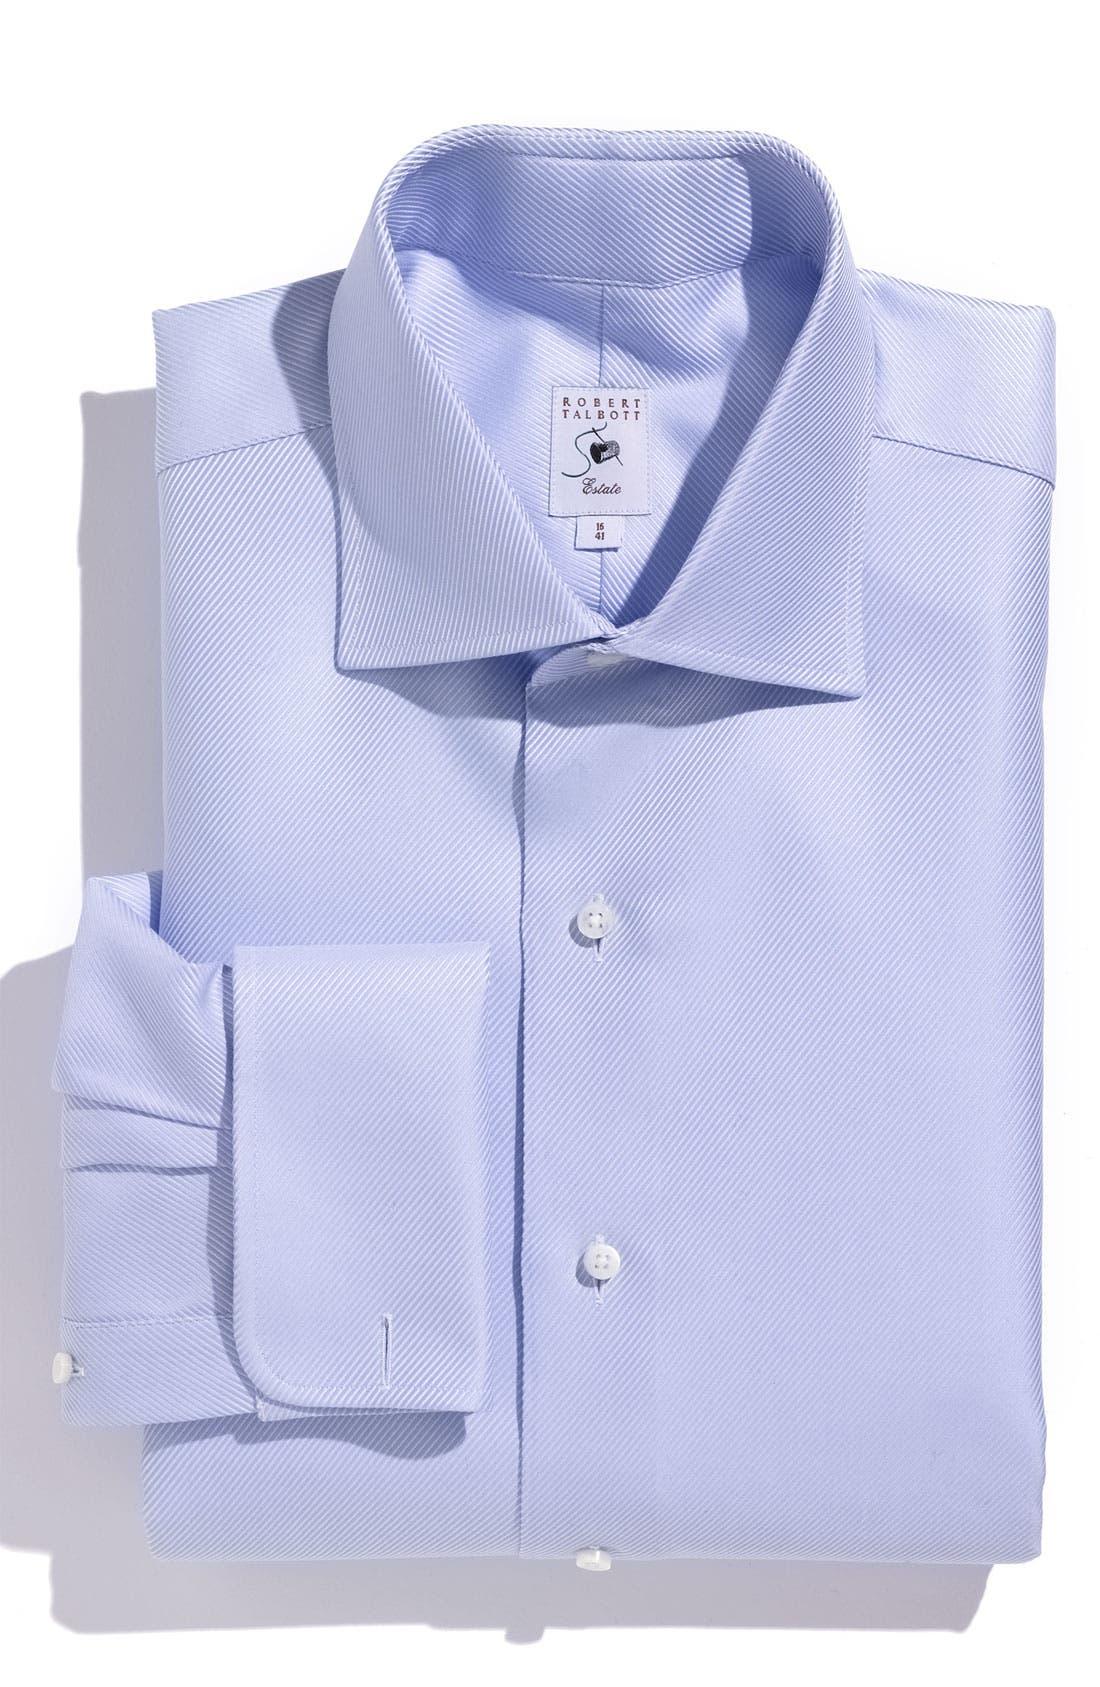 Alternate Image 1 Selected - Robert Talbott Regular Fit Estate Dress Shirt (Online Exclusive)